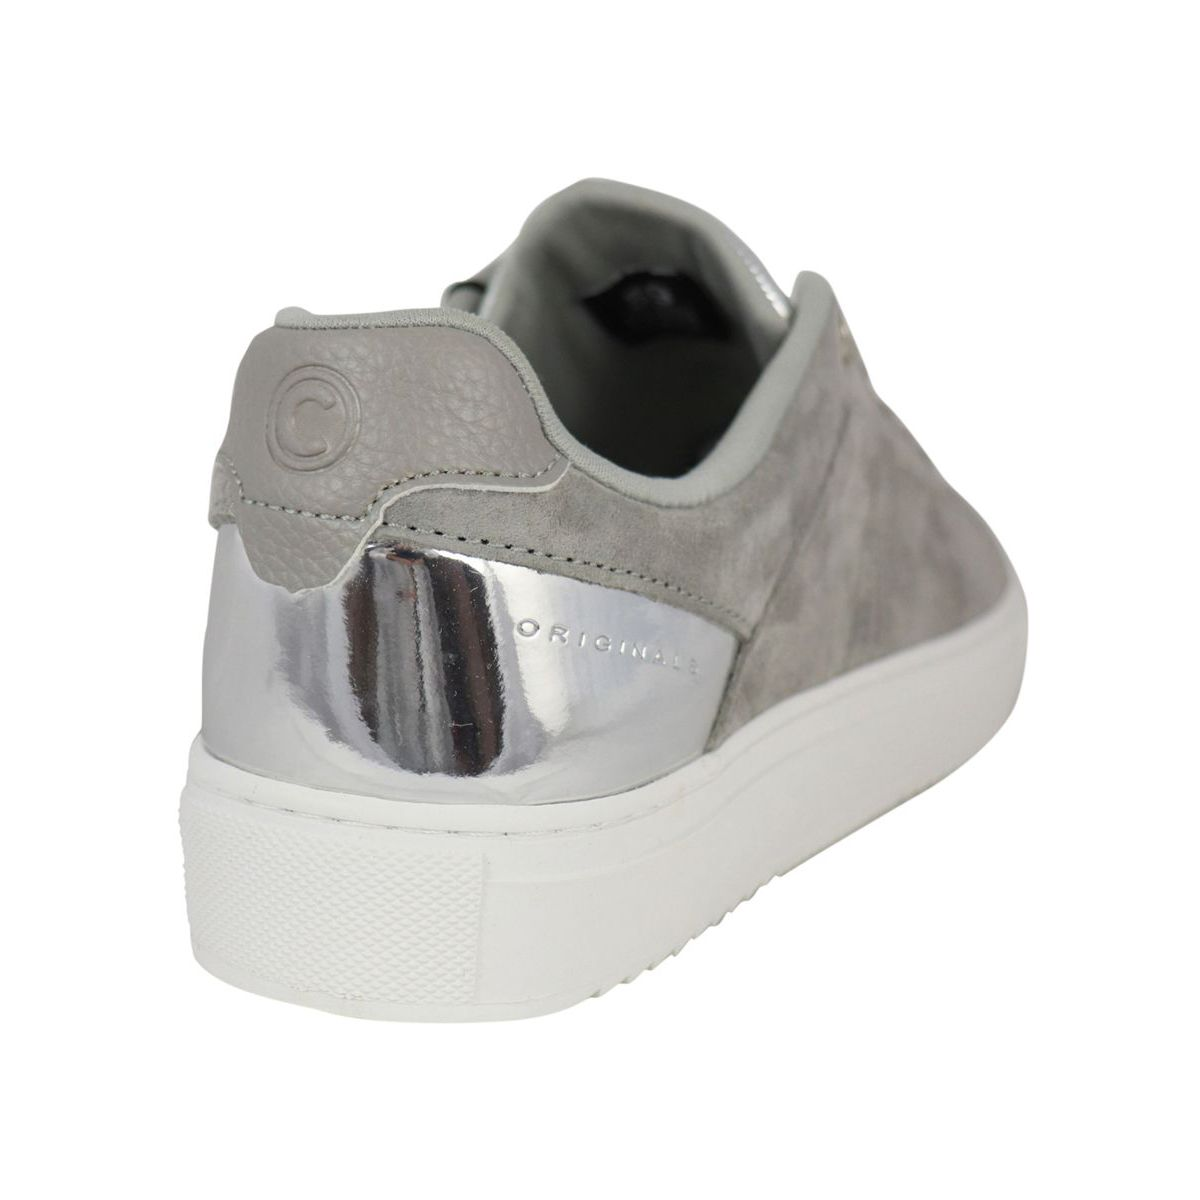 Bradbury Lux 136 sneakers in suede leather Grey Colmar Shoes